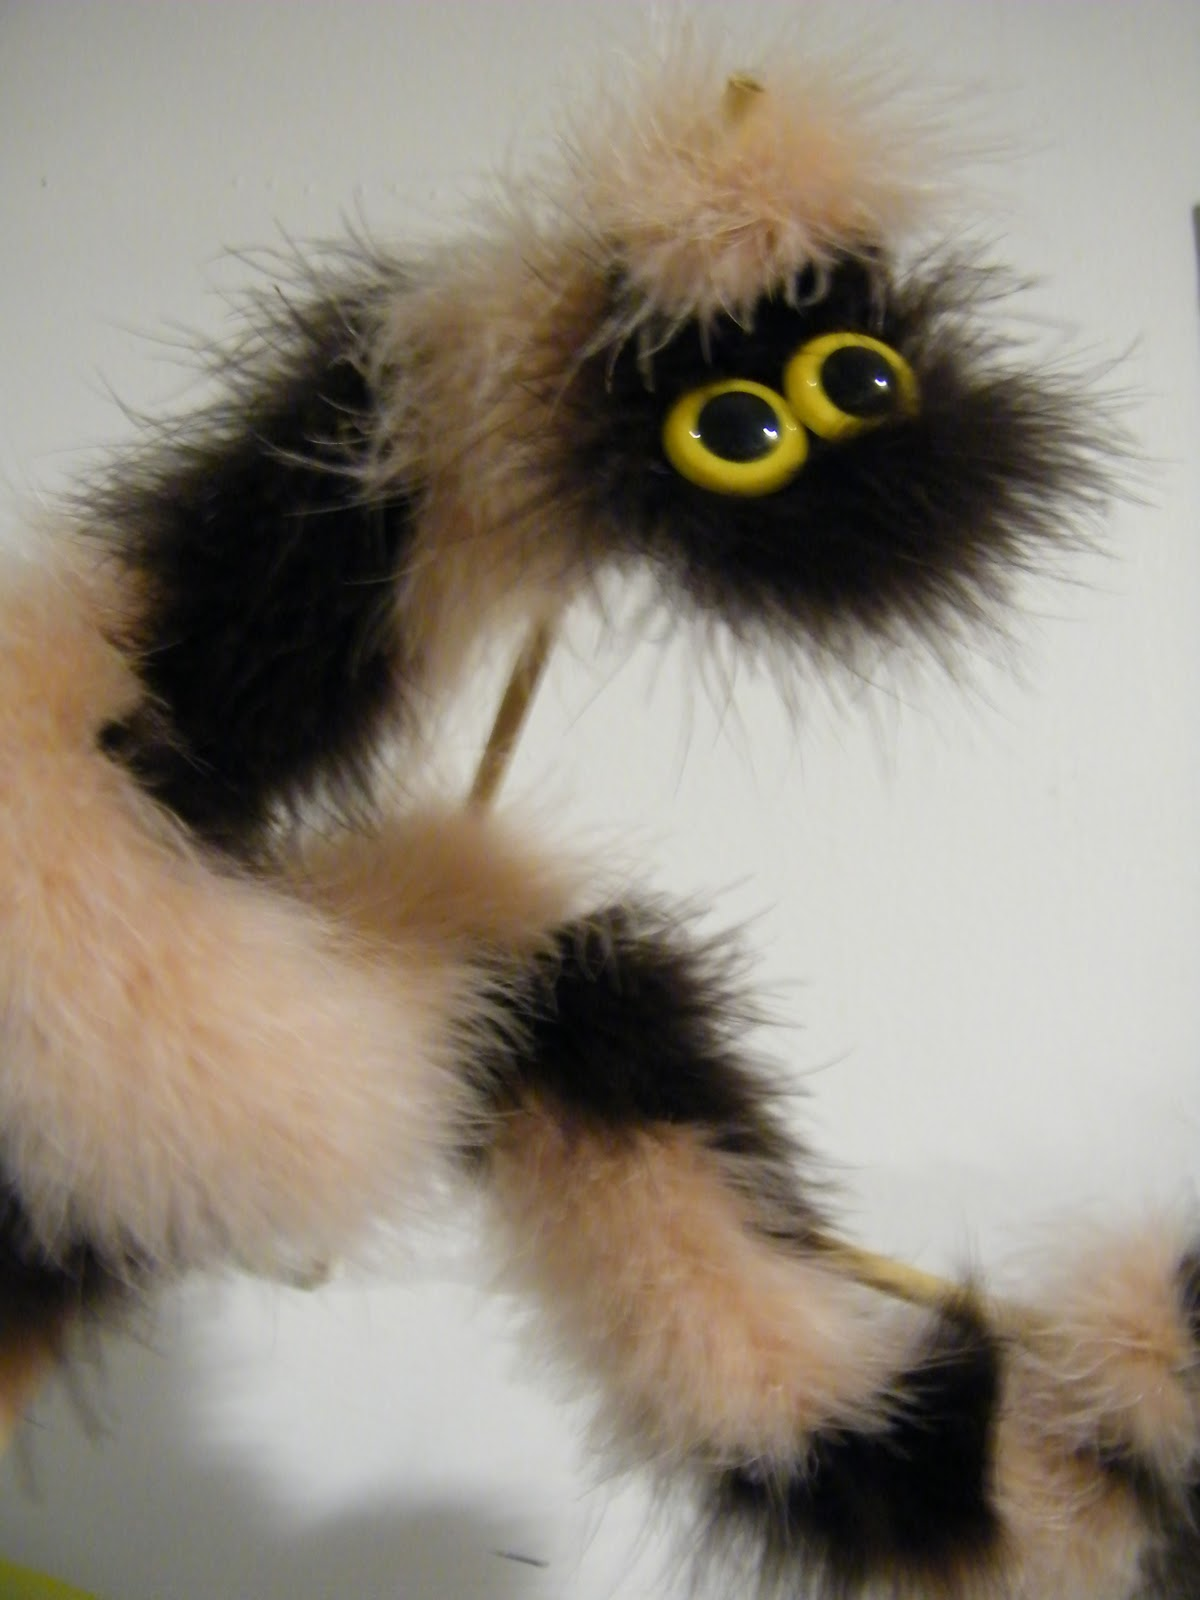 Puppet-A-Day: Day #48: Fuzzy Wuzzy Caterpillar